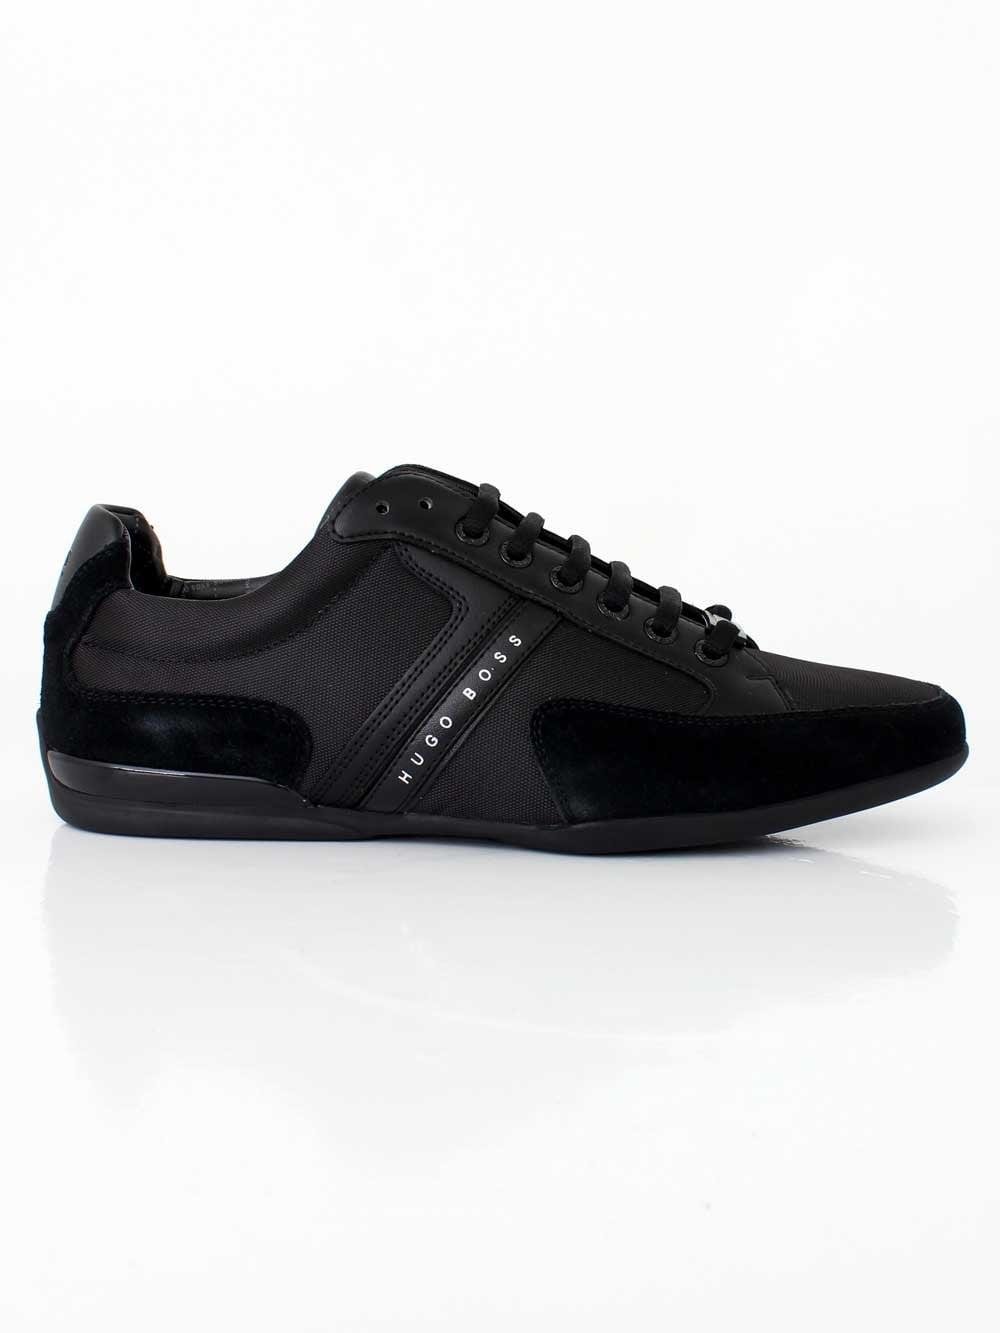 Hugo Boss Spacit Trainer in Black